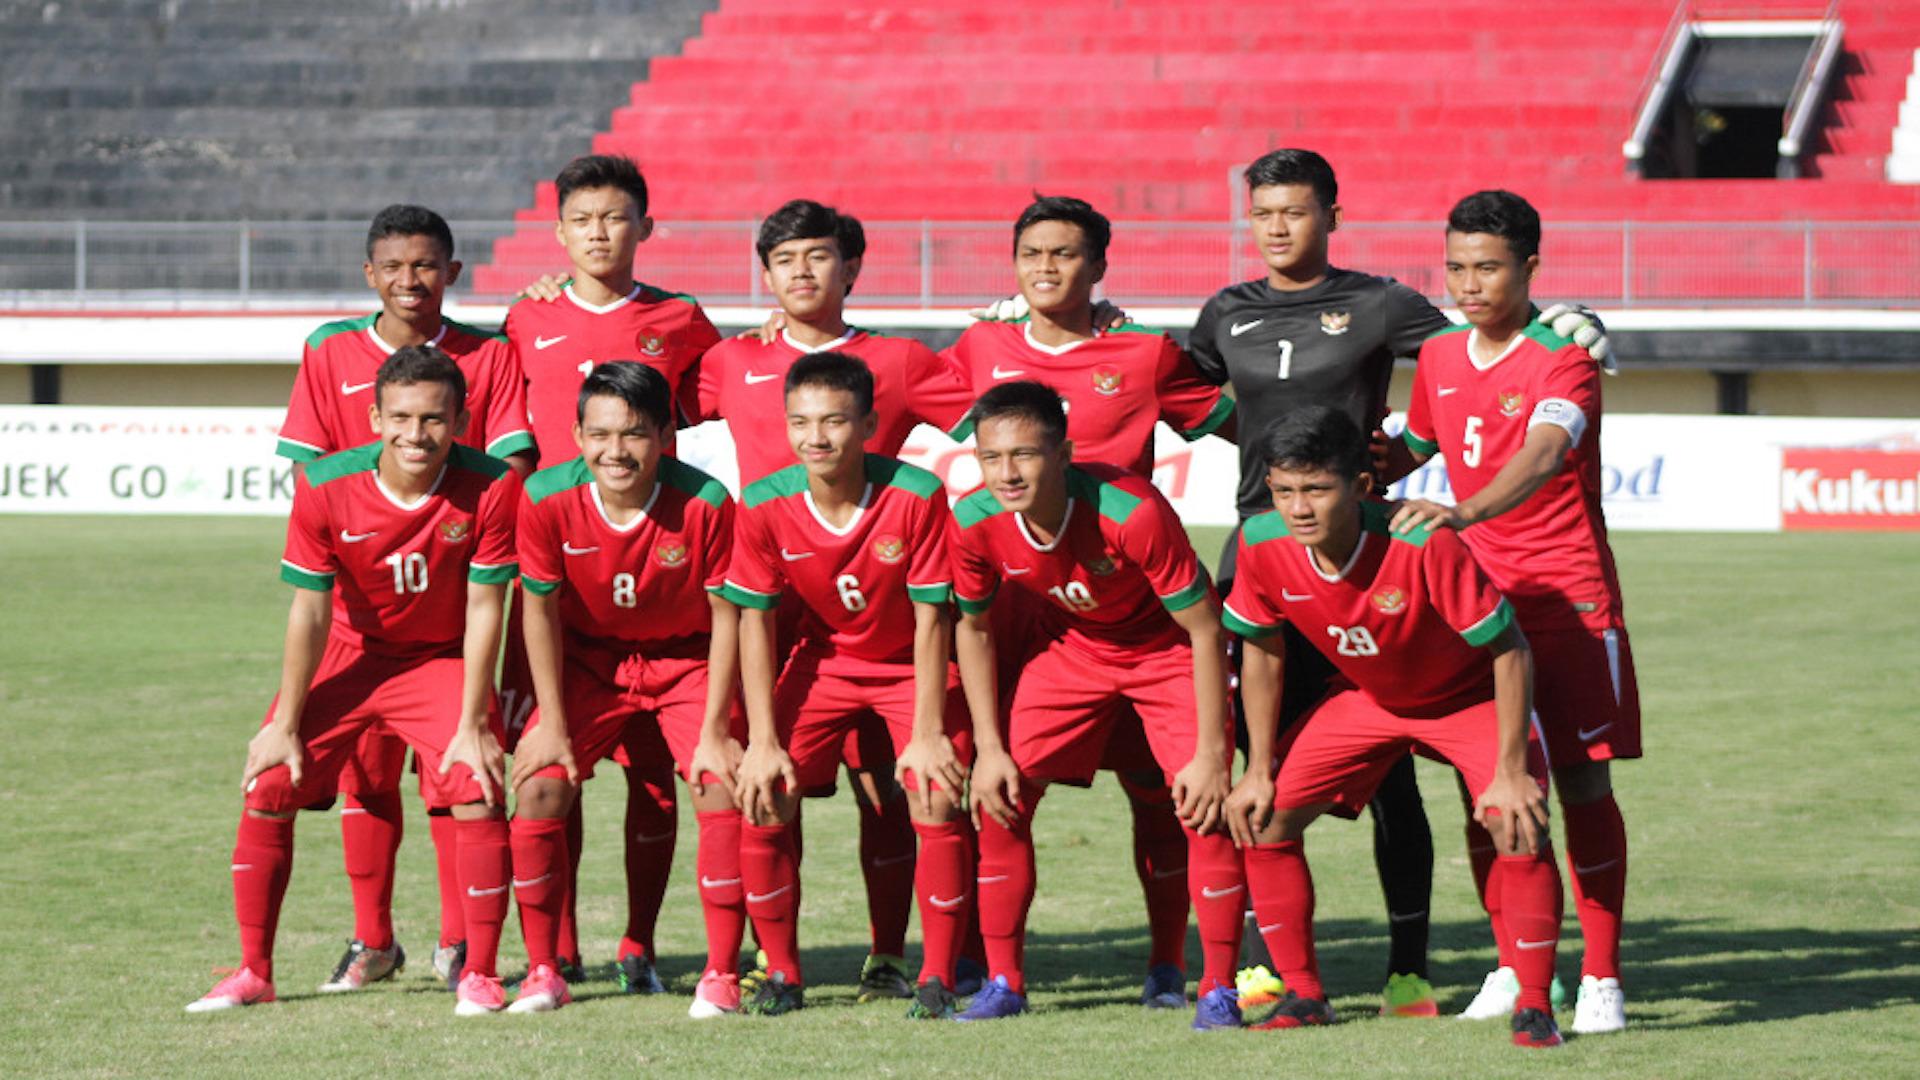 Brazil U V Indonesia U Laporan Pertandingan  Festival Dunia Toulon Yunior Goal Com